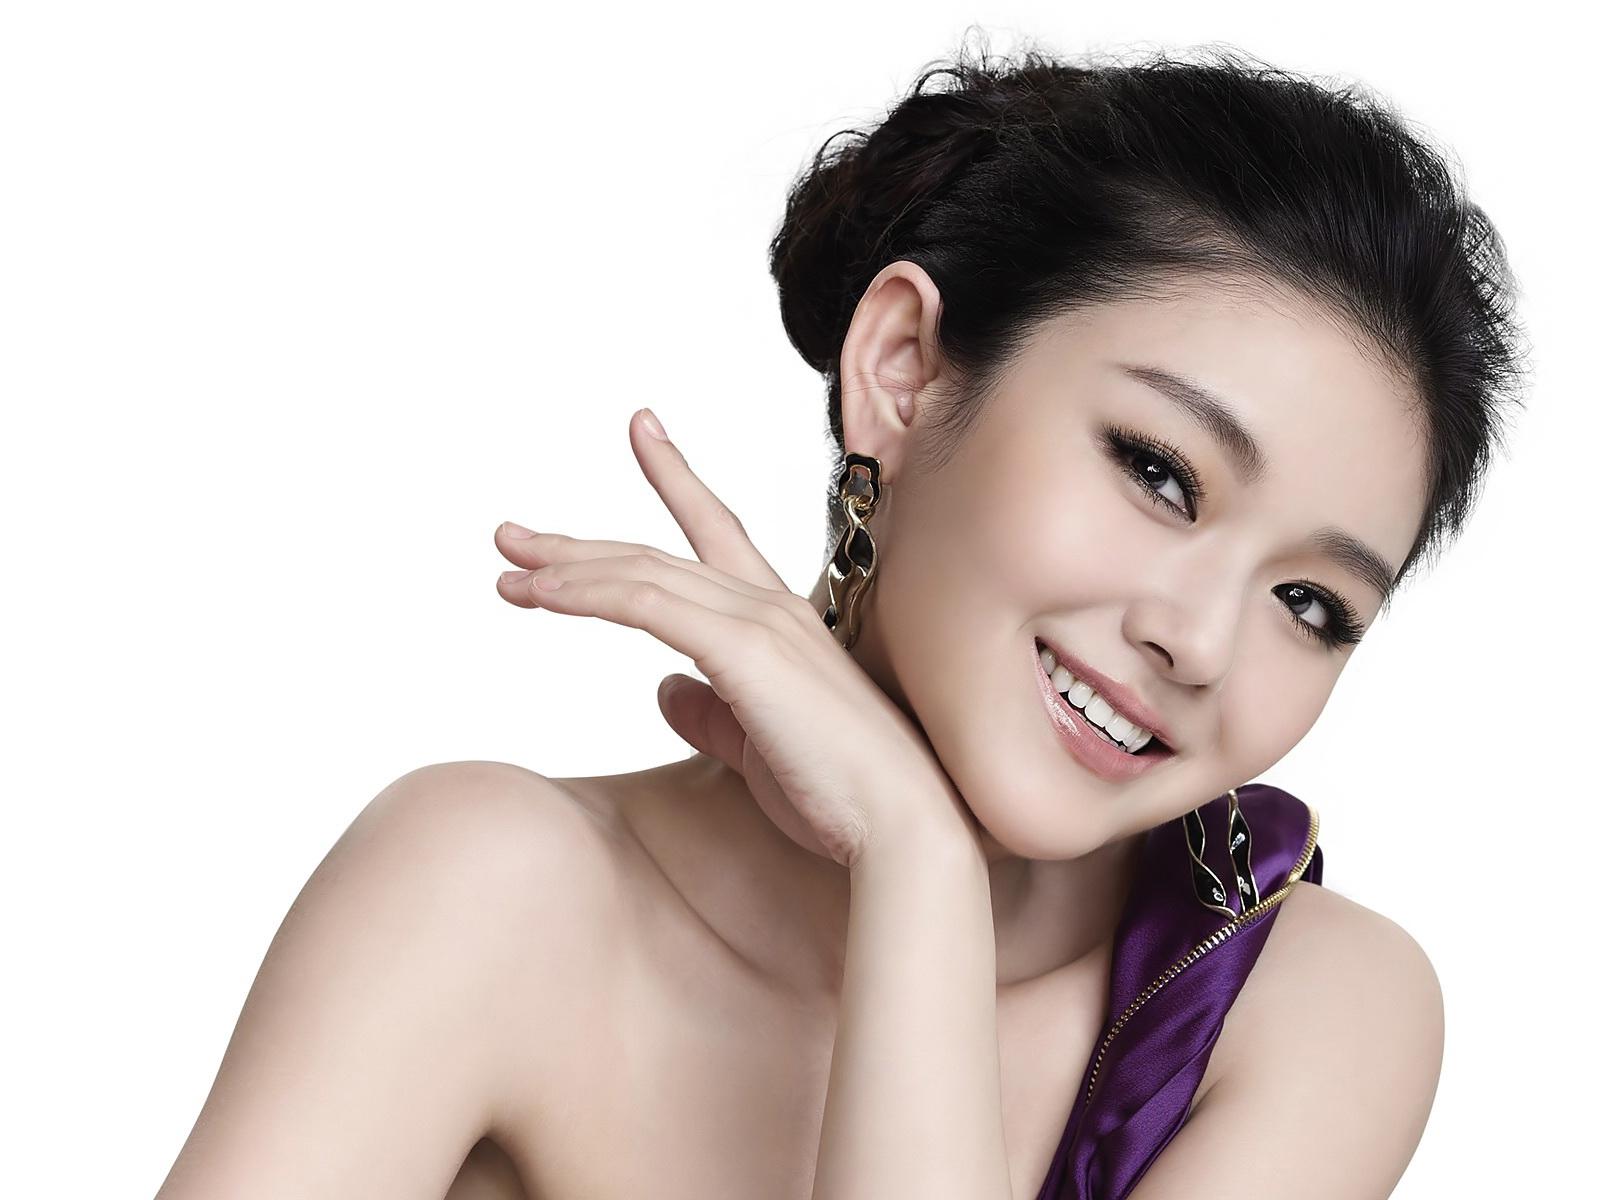 Hot 18 year old asian women wallpaper 45 Girl Name Wallpapers On Wallpapersafari